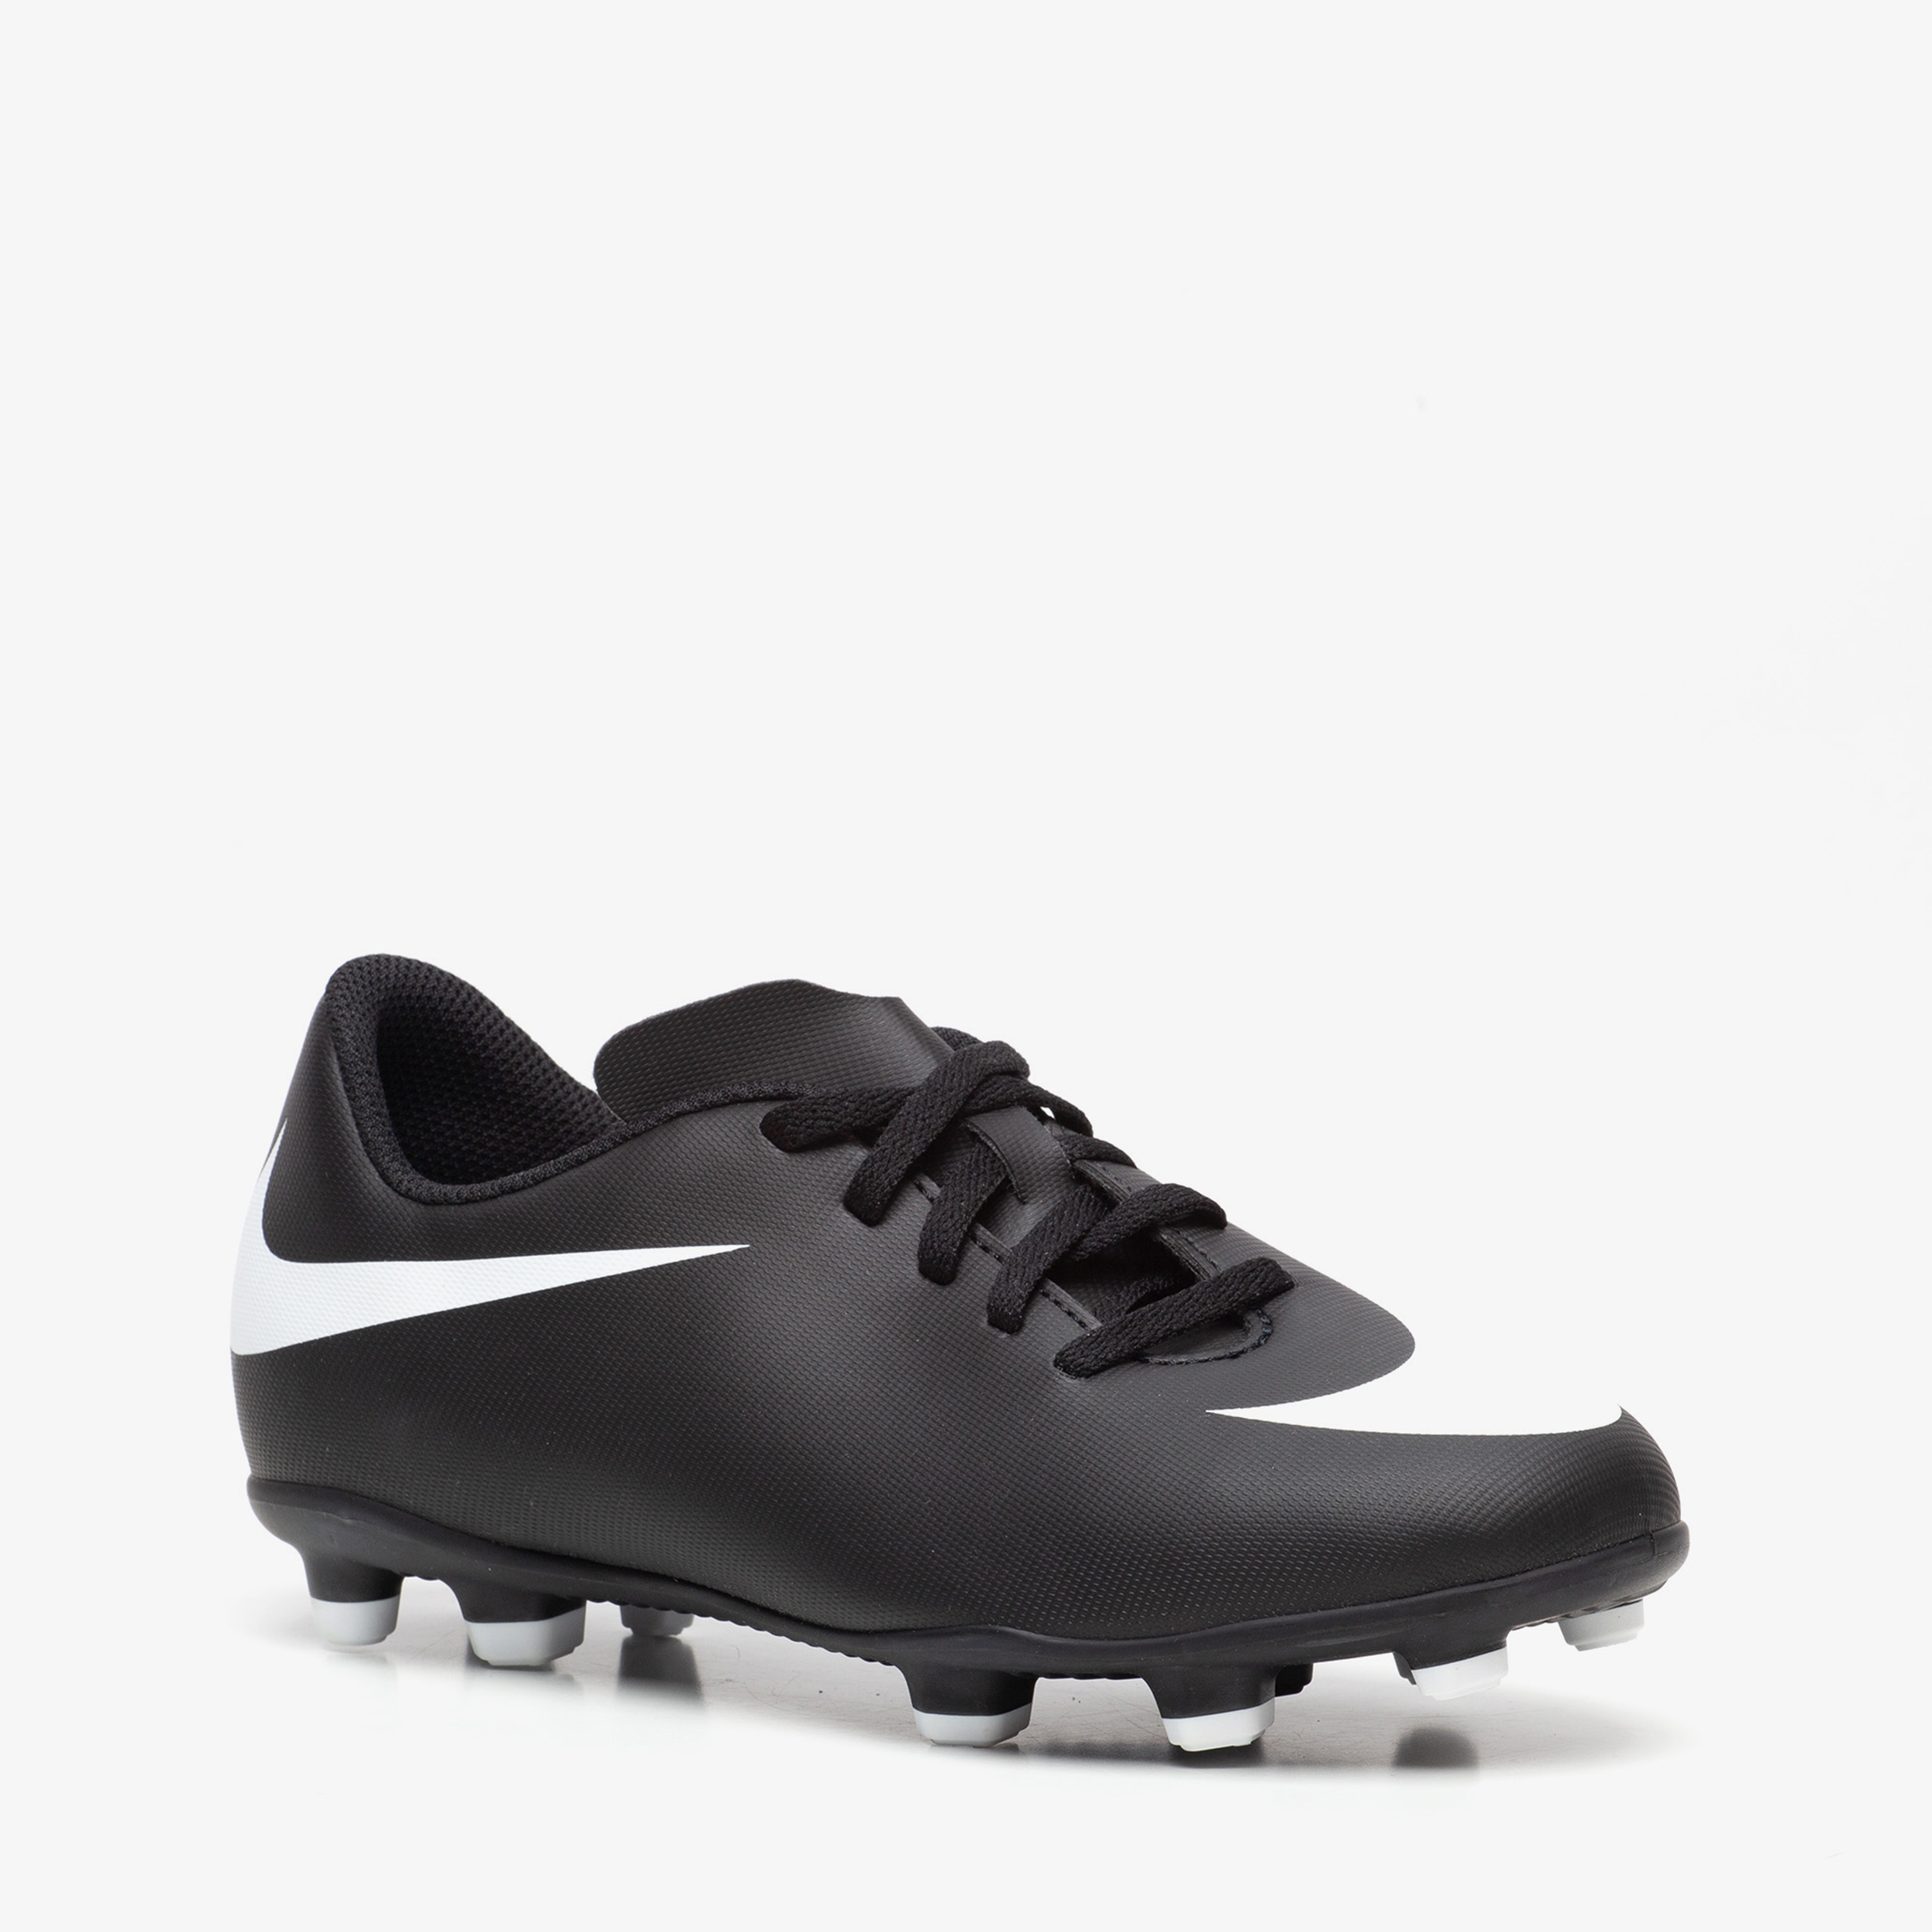 Nike Bravata II voetbalschoenen FG | Scapino.nl